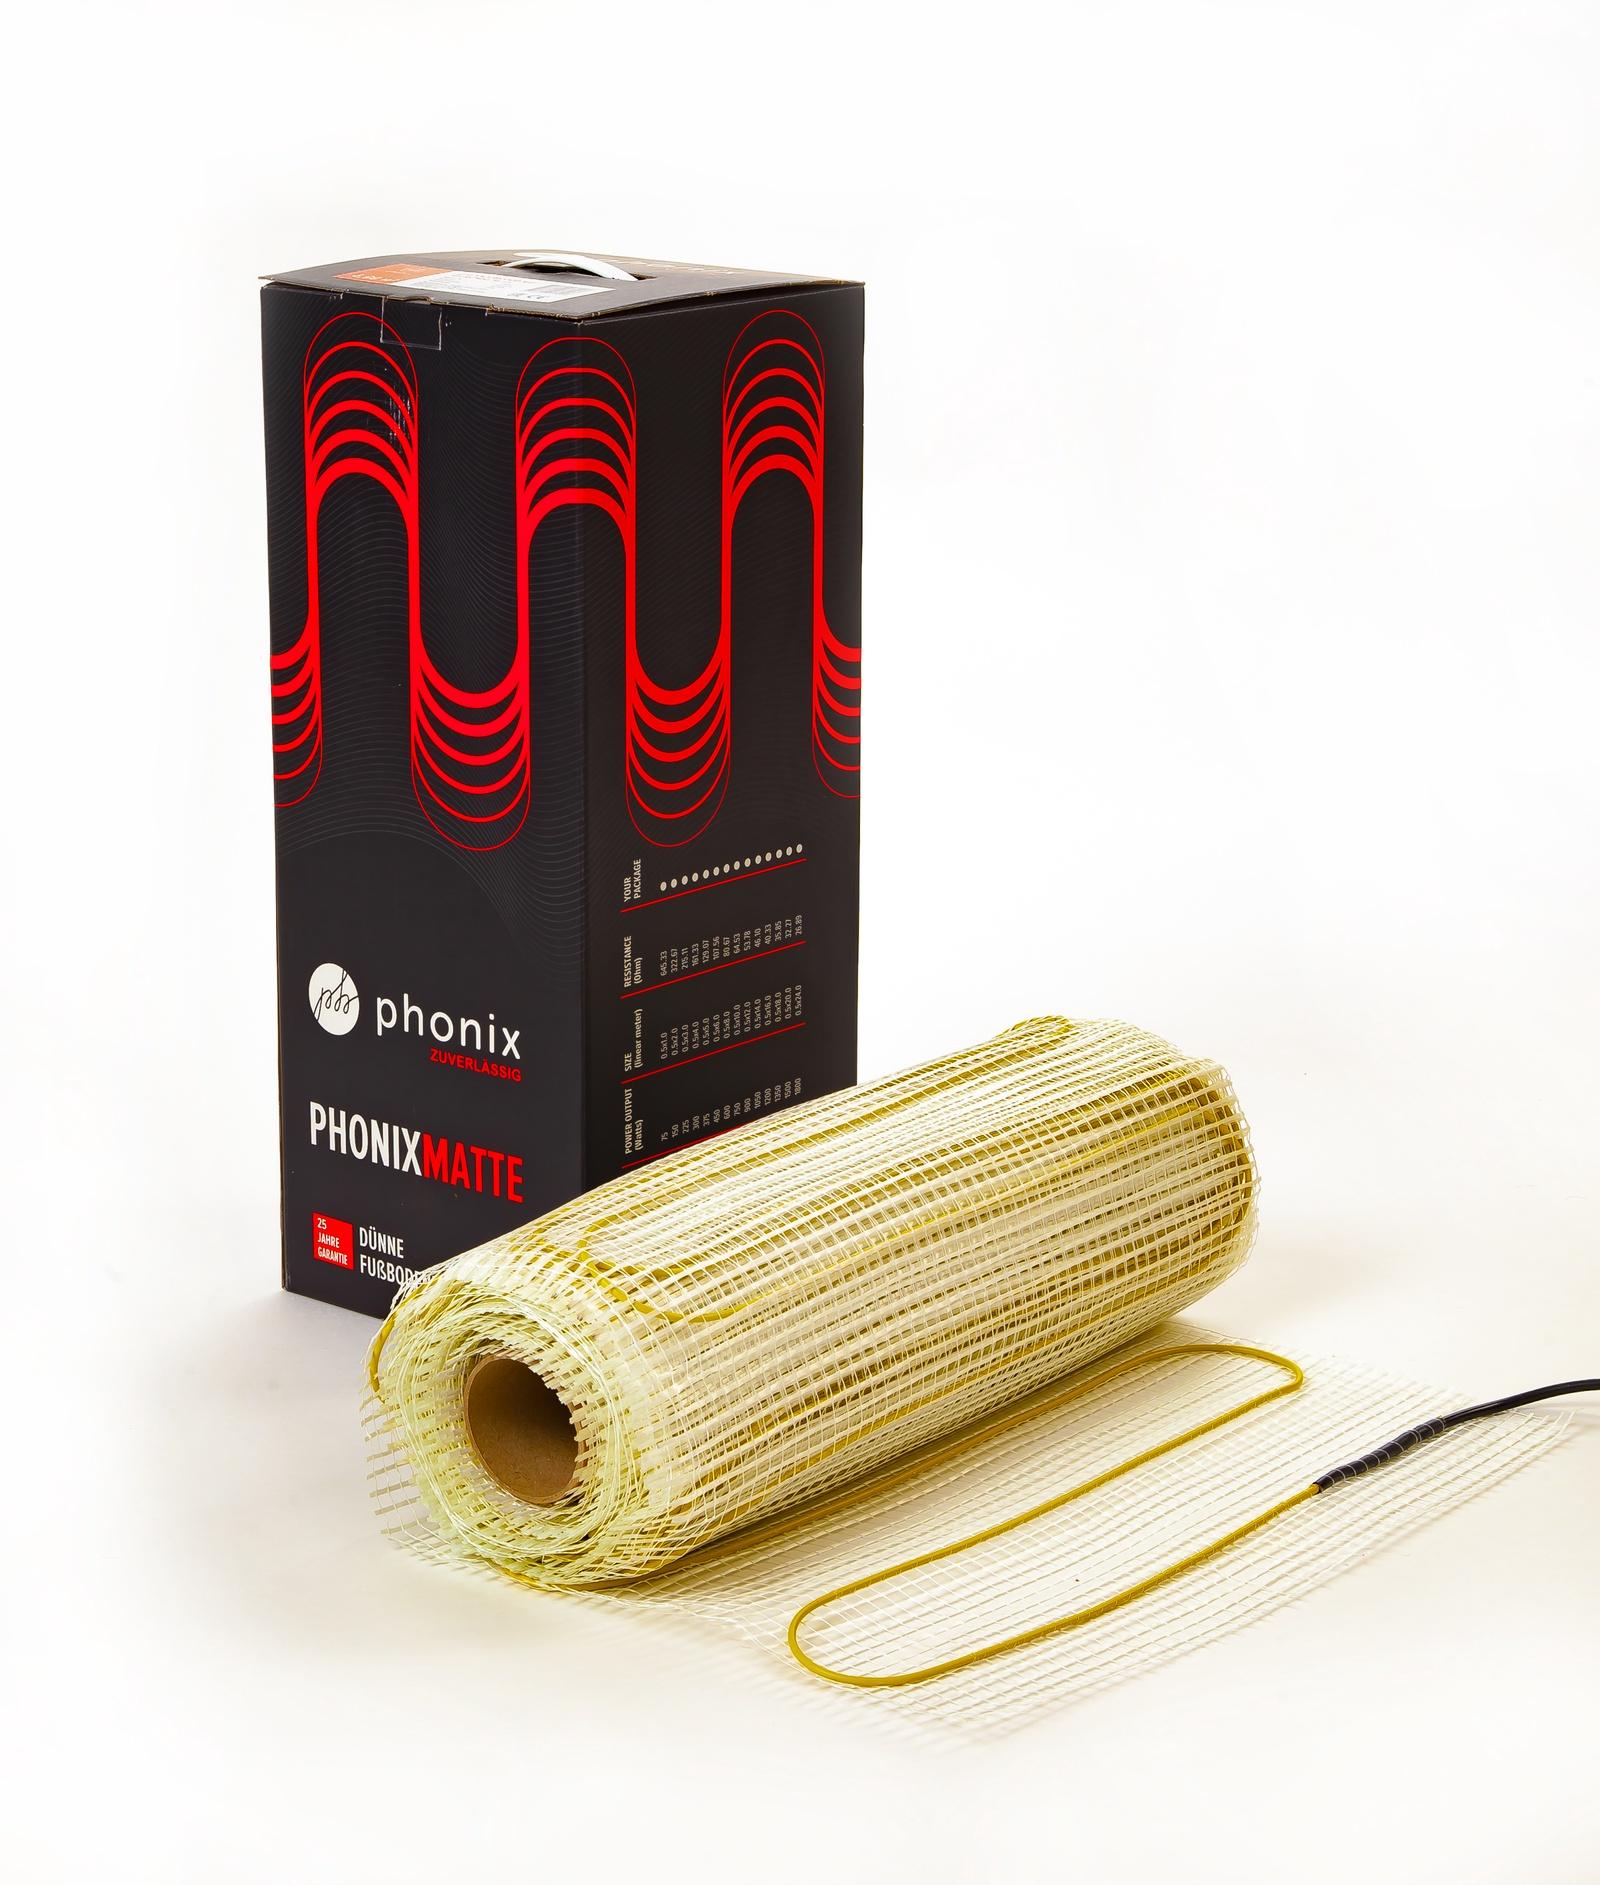 Электрический теплый пол PHONIX 0,5 x 1,0 м, 75 Вт (0,5м2)